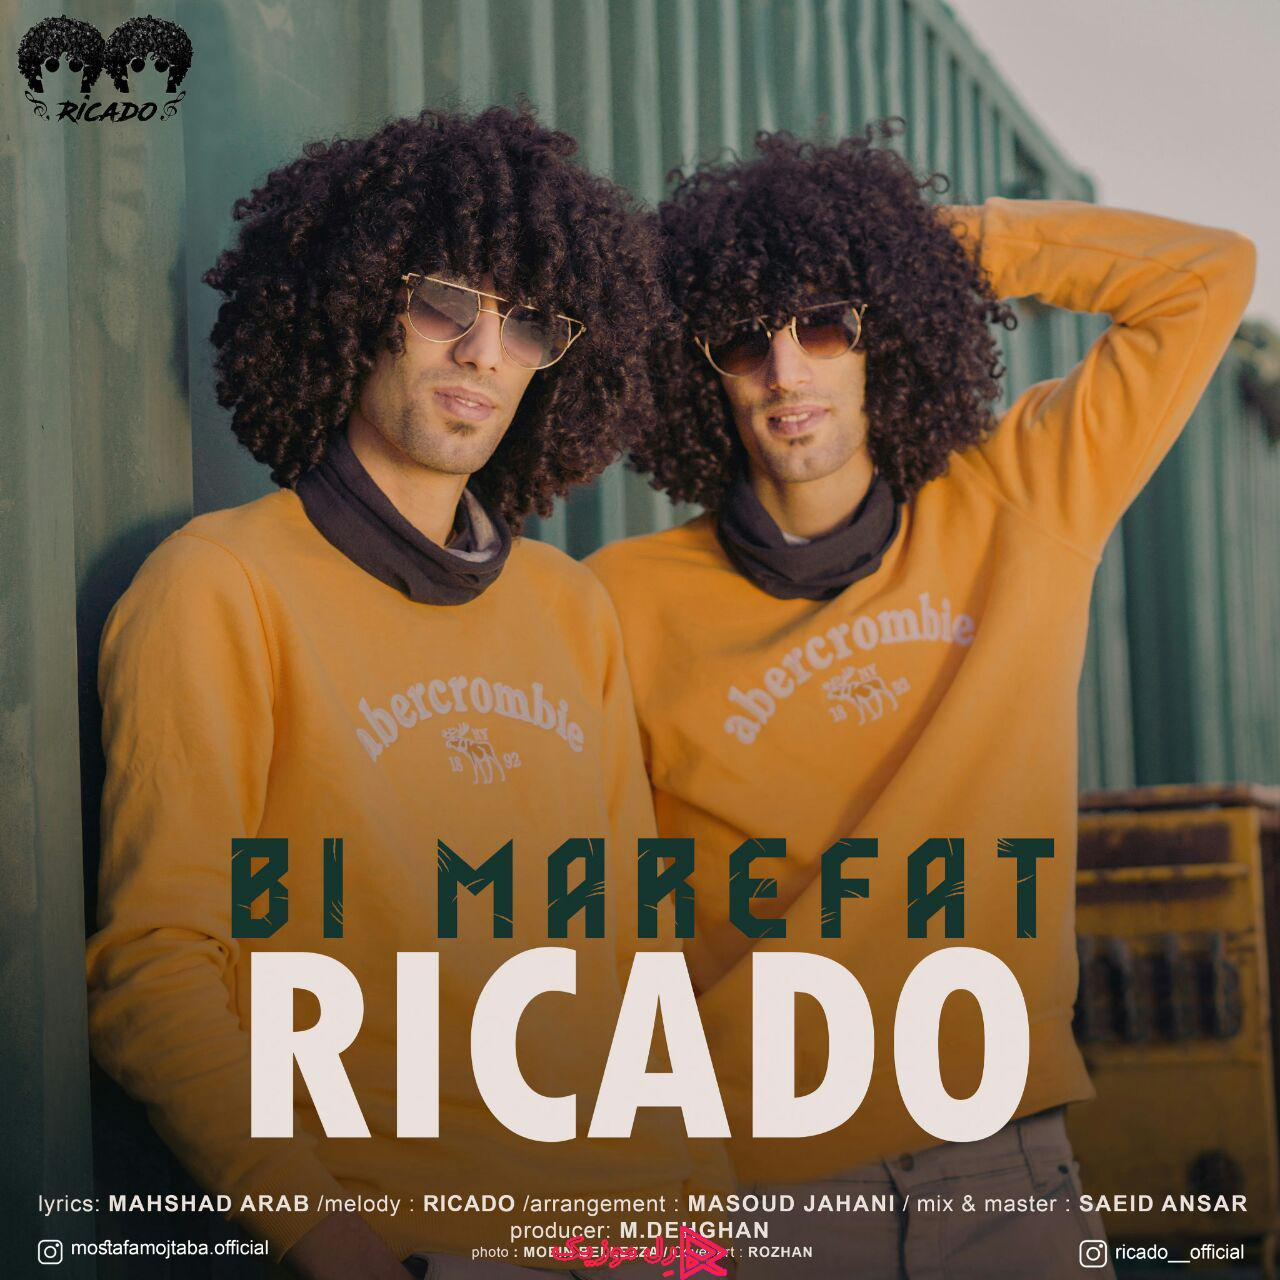 Ricado Bi Maarefat RellMusic - دانلود آهنگ ریکادو به نام بی معرفت